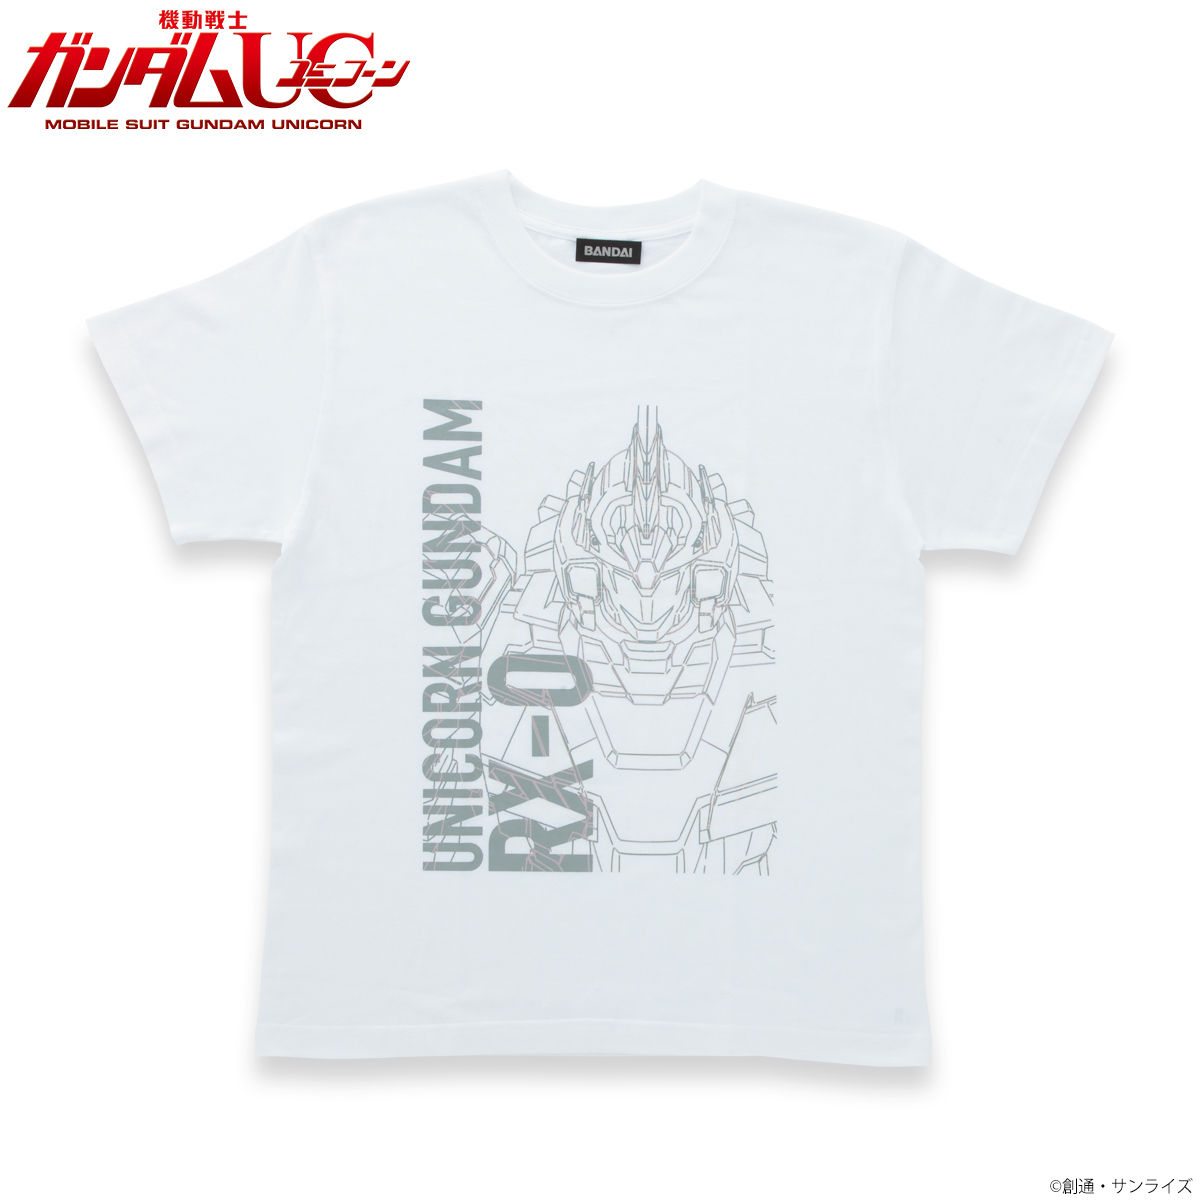 GUNDAM UC Unicorn/Destroy Mode T-shirt